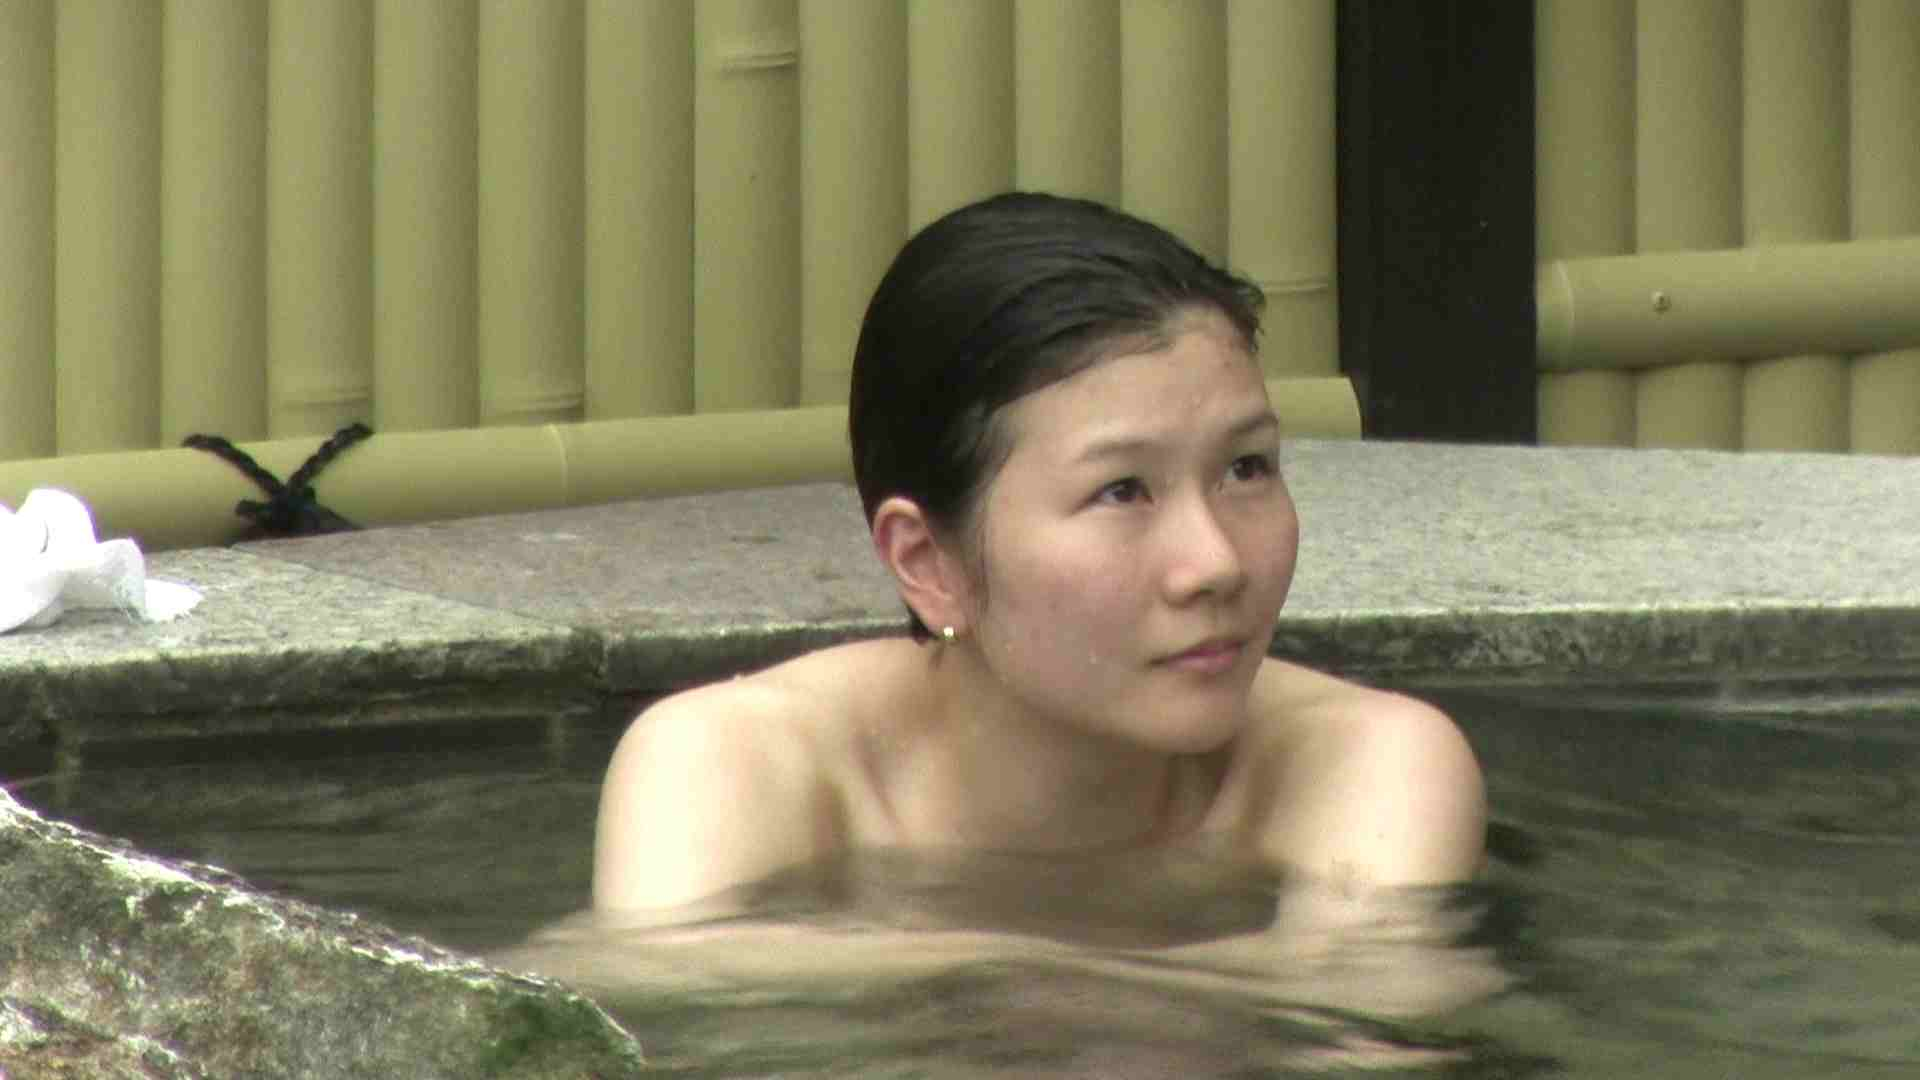 Aquaな露天風呂Vol.187 盗撮   HなOL  96pic 23